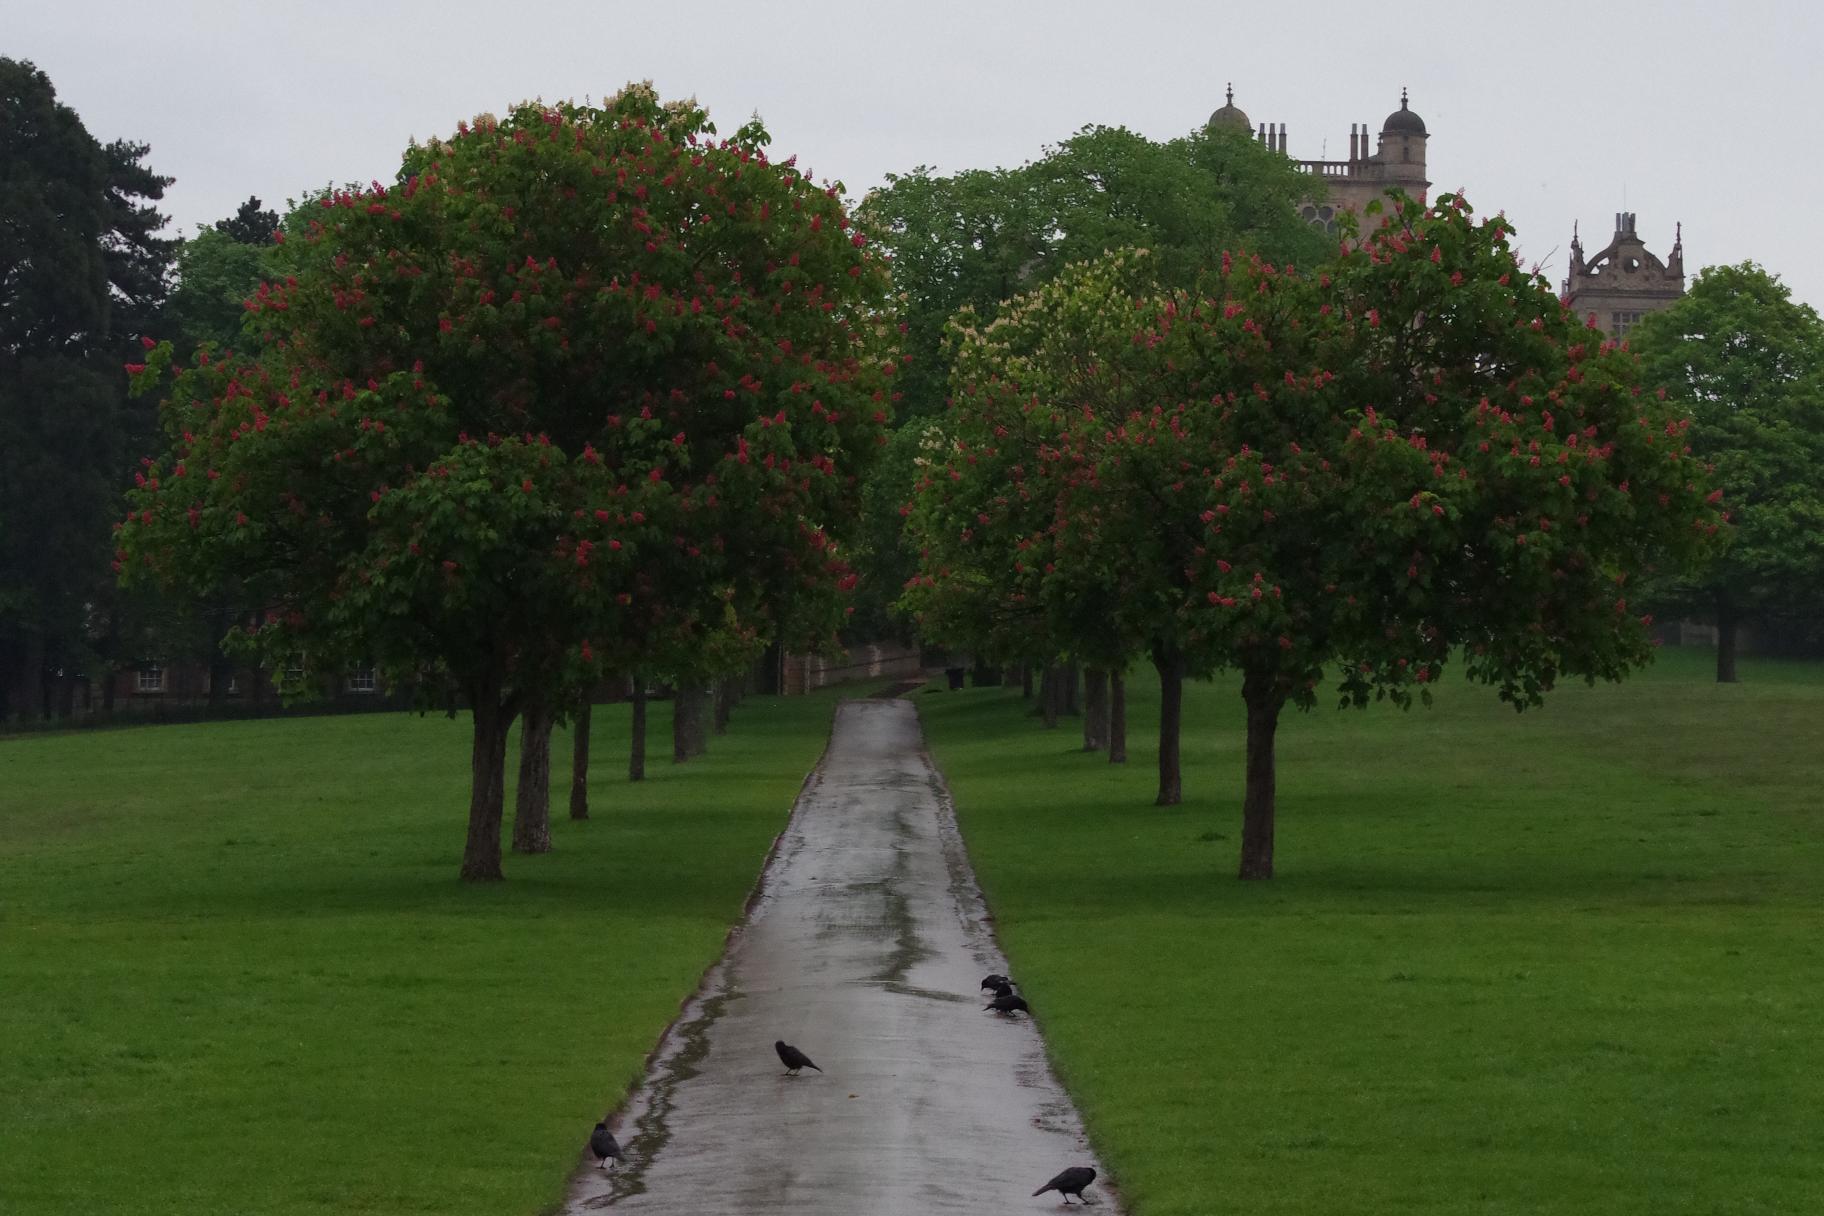 Trees in Flower